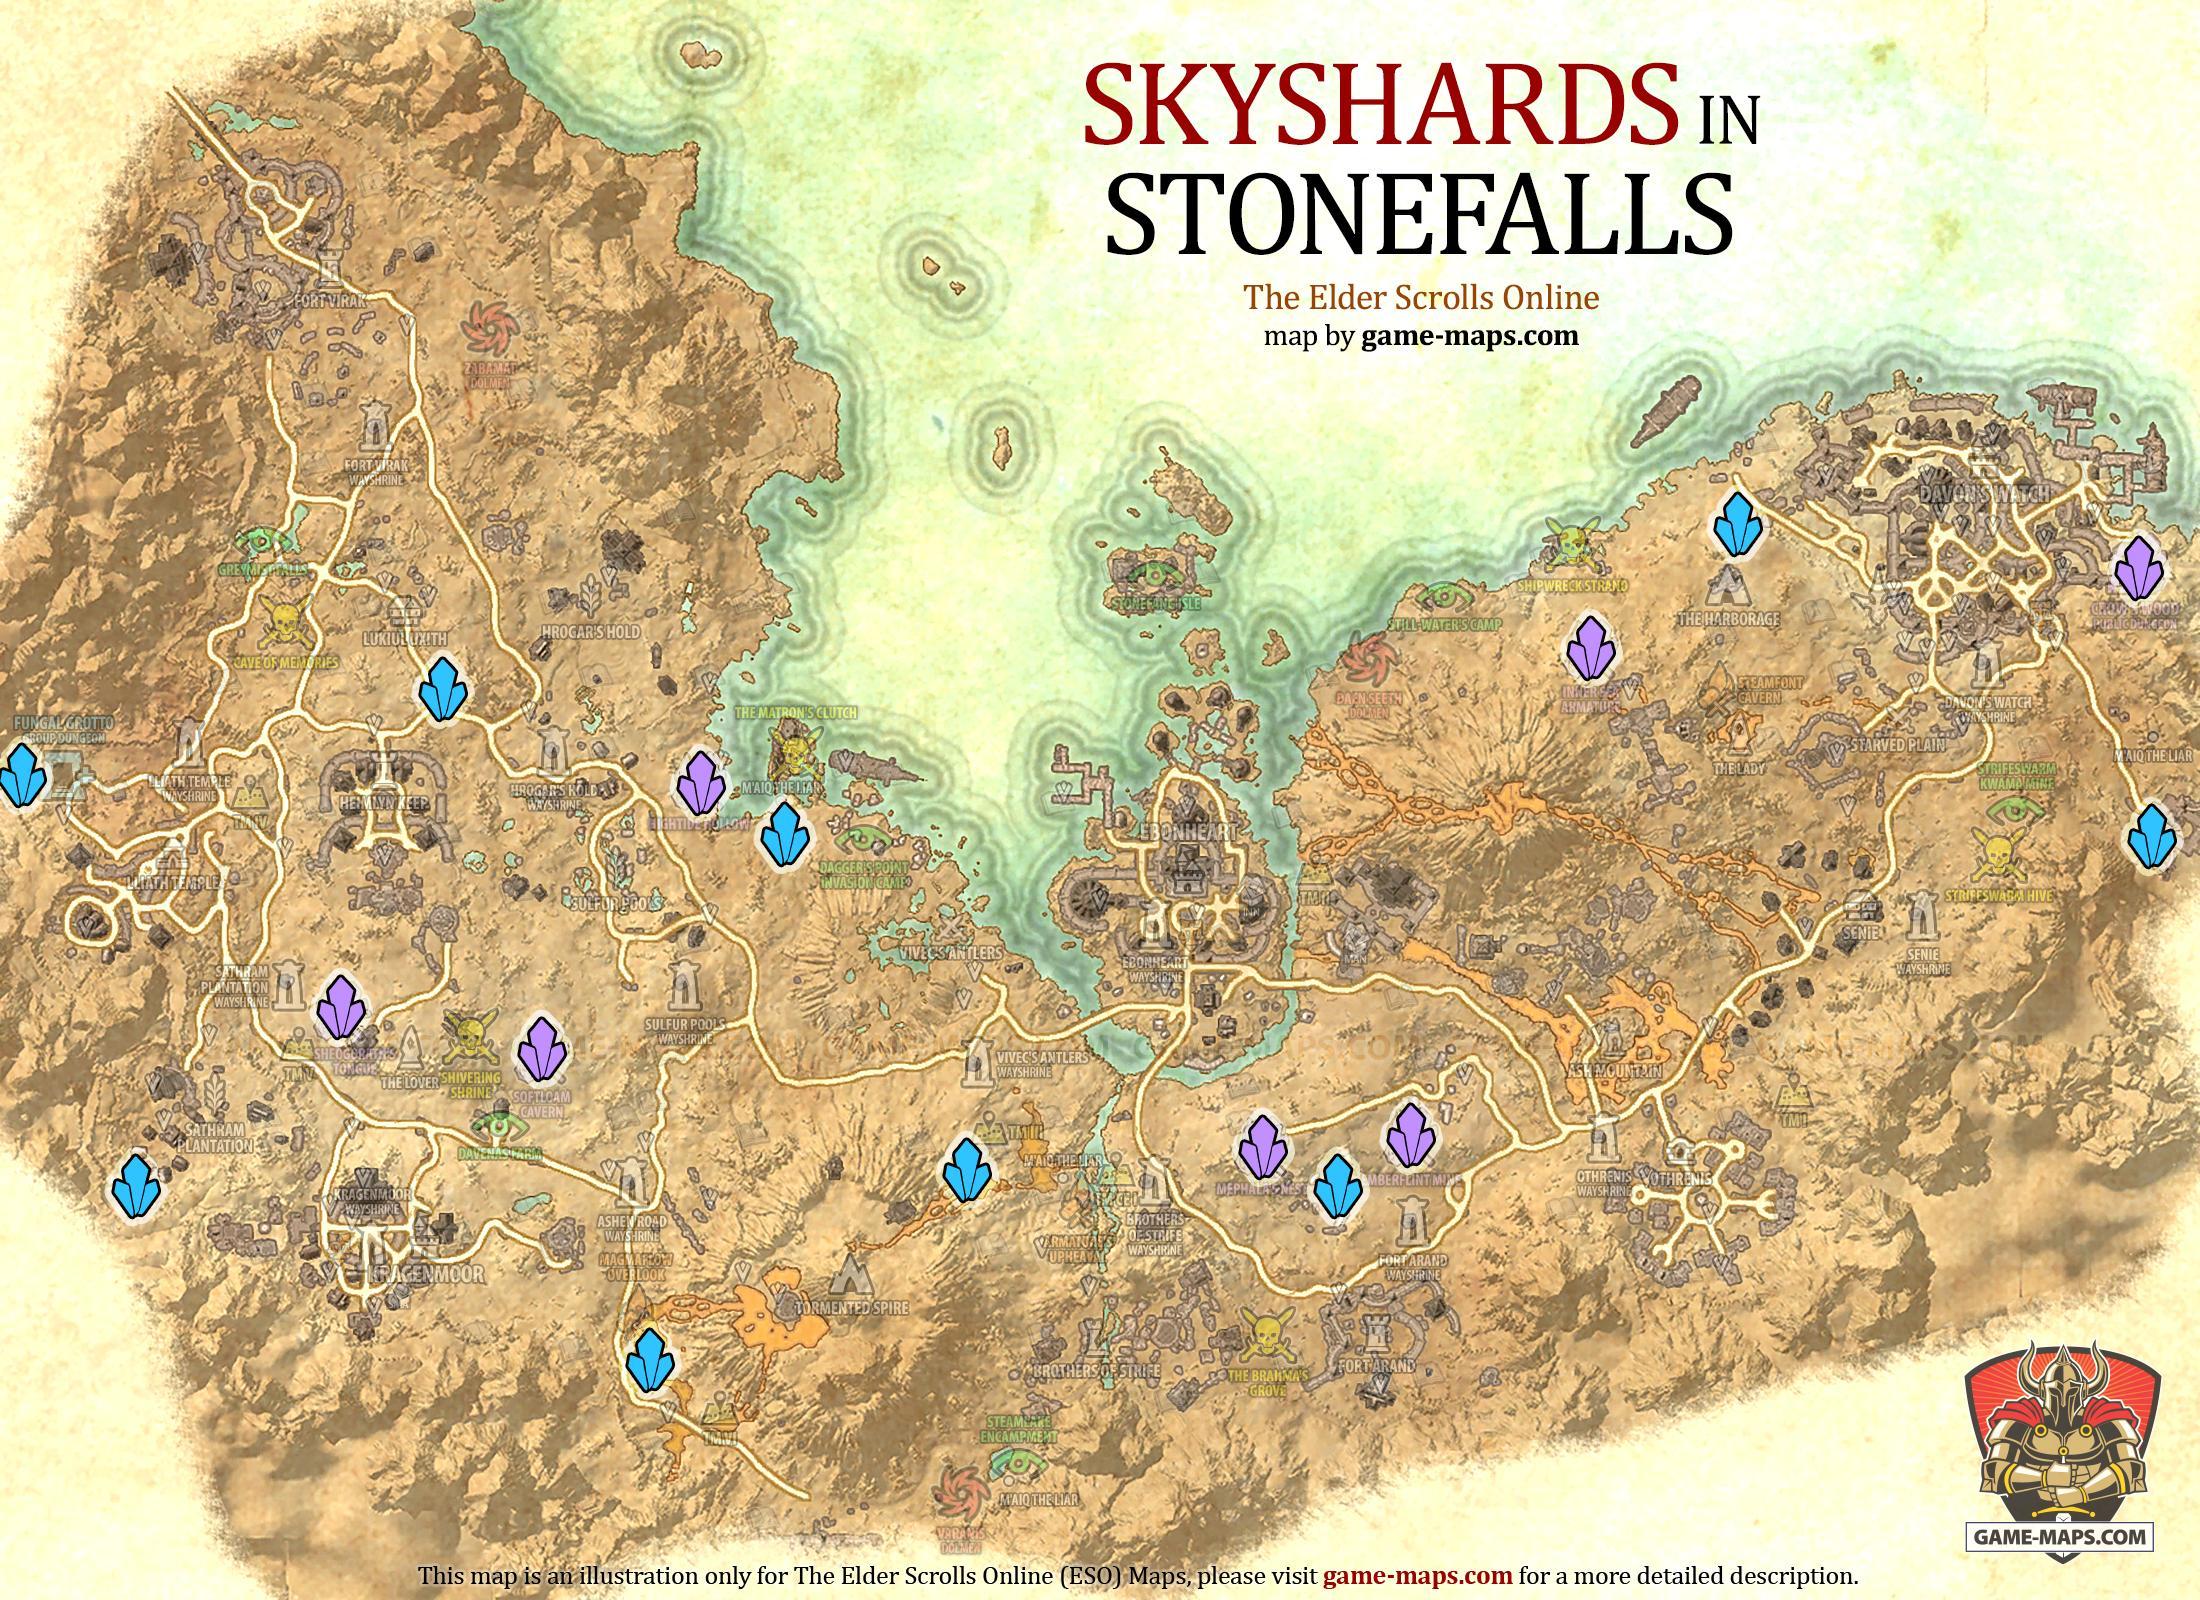 Stonefalls Skyshard Map Stonefalls Skyshards Location Map   ESO | game maps.com Stonefalls Skyshard Map